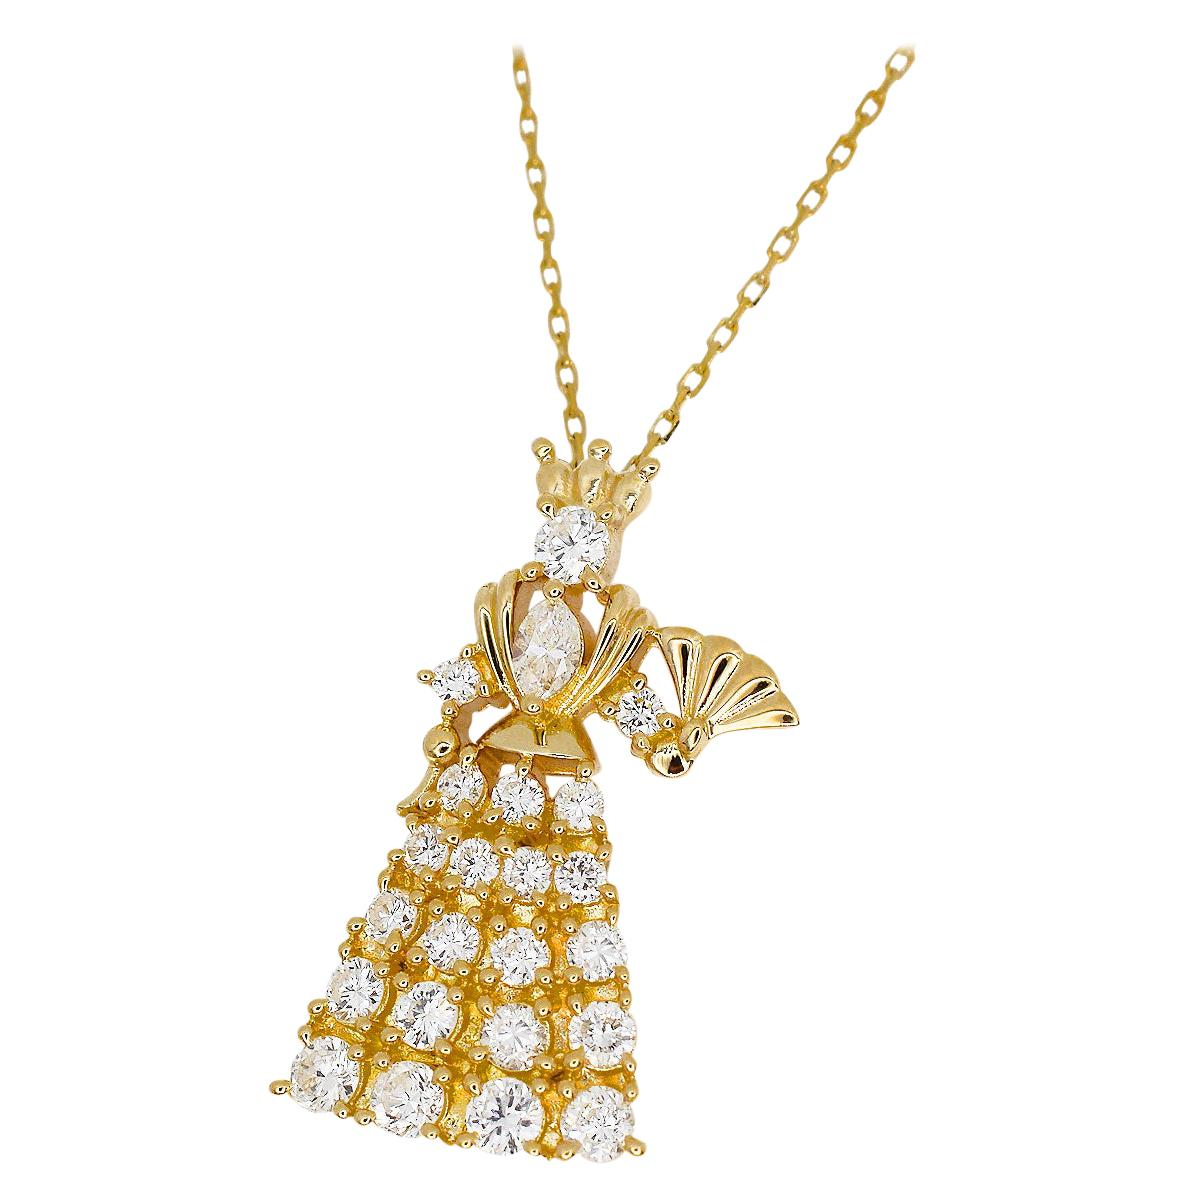 TASAKI 0.63 Carat Diamond 18 Karat Yellow Gold Queen Pendant Necklace